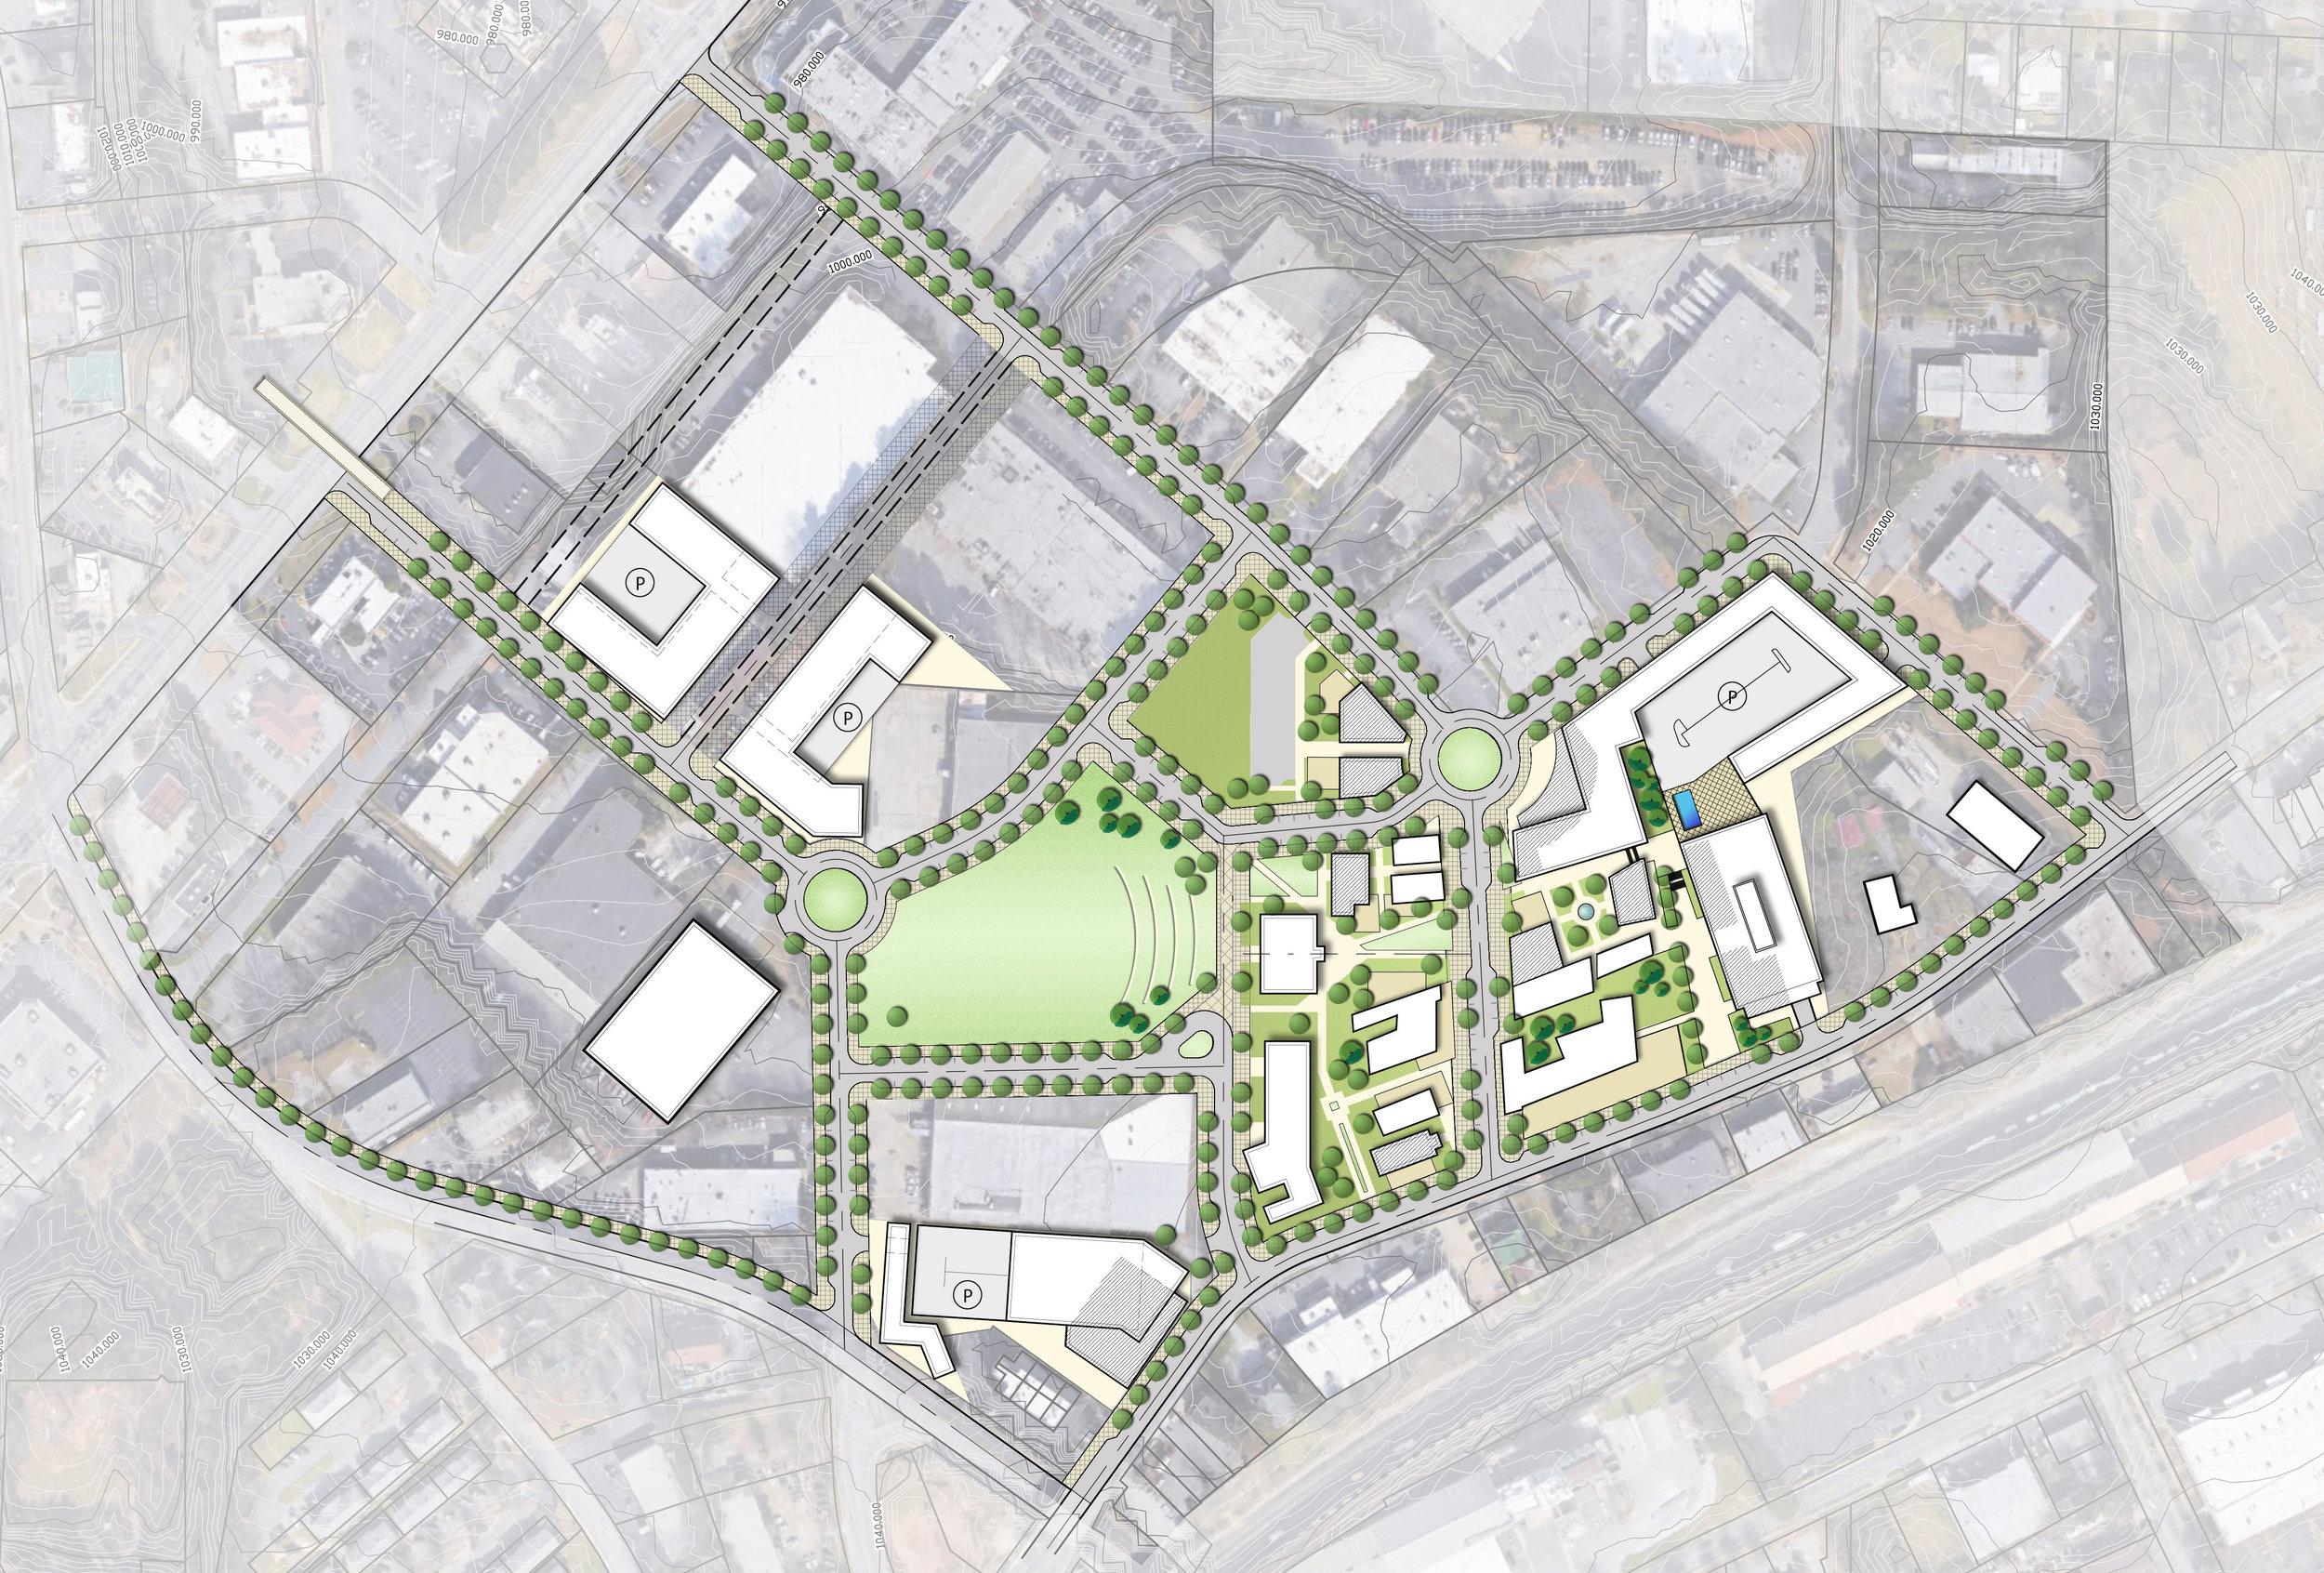 3. Unique Nodes - utilize street grid to connect and provide access